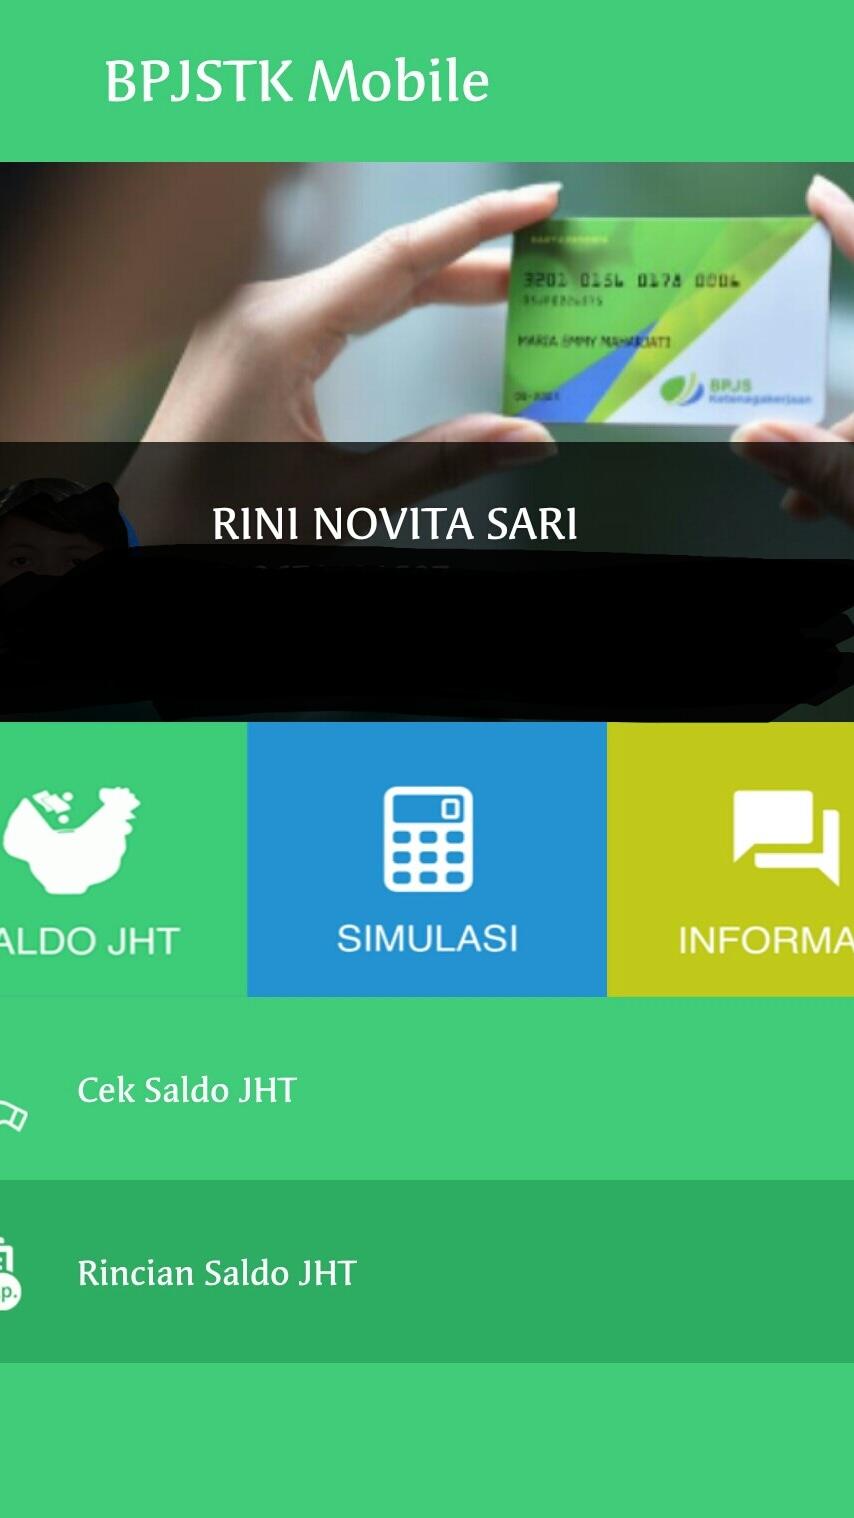 Bpjs tk mobile